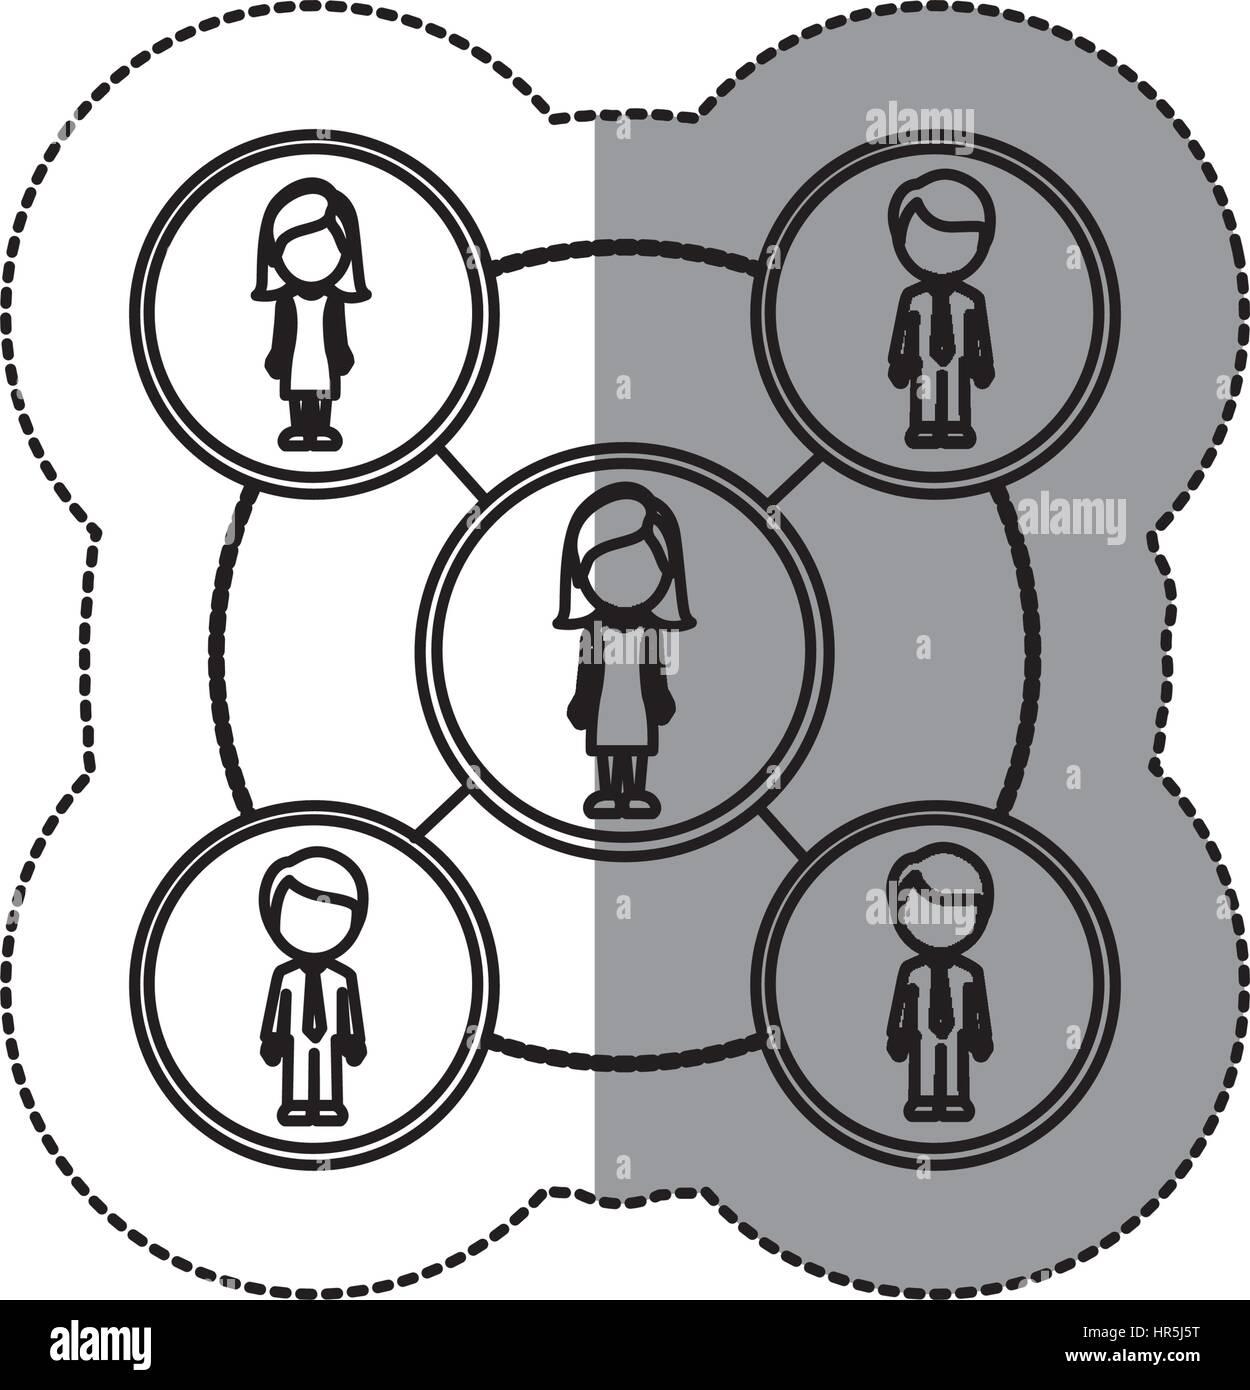 People Network Team Icon Vector Stockfotos & People Network Team ...